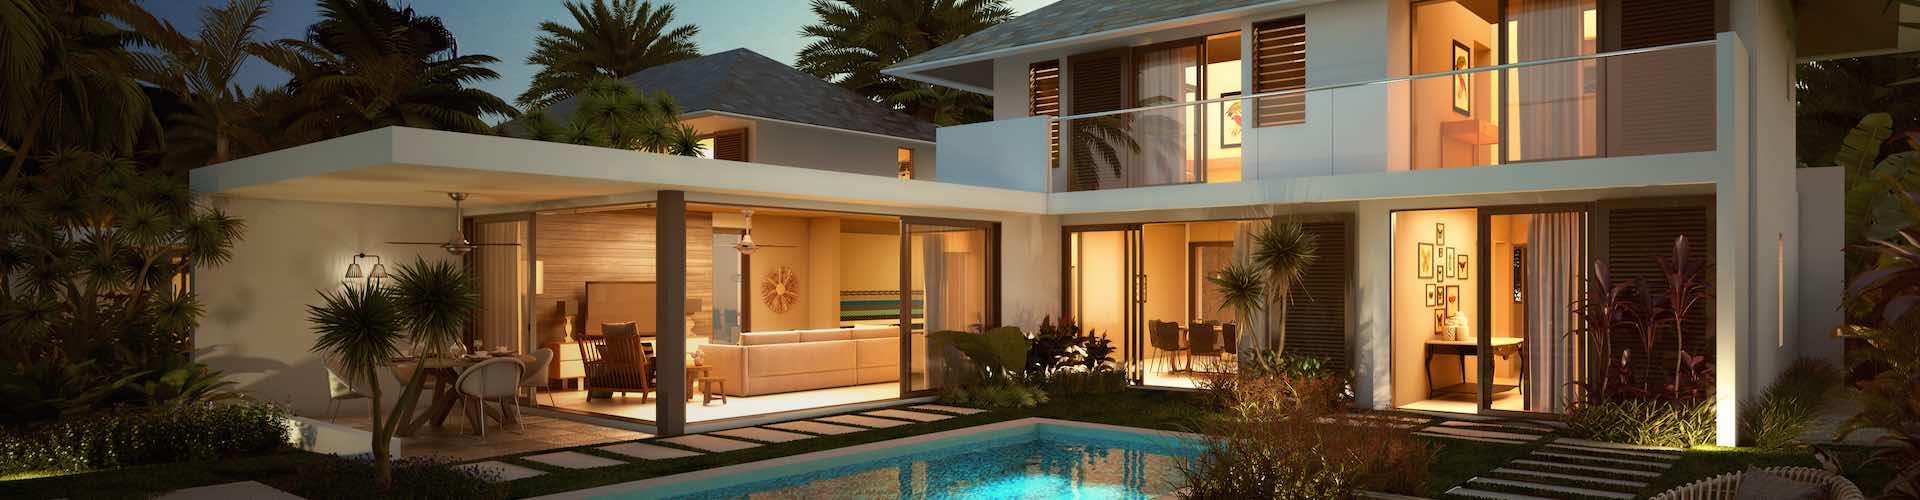 achat vente immobilier ile maurice appartement villa propriete et residence annonce